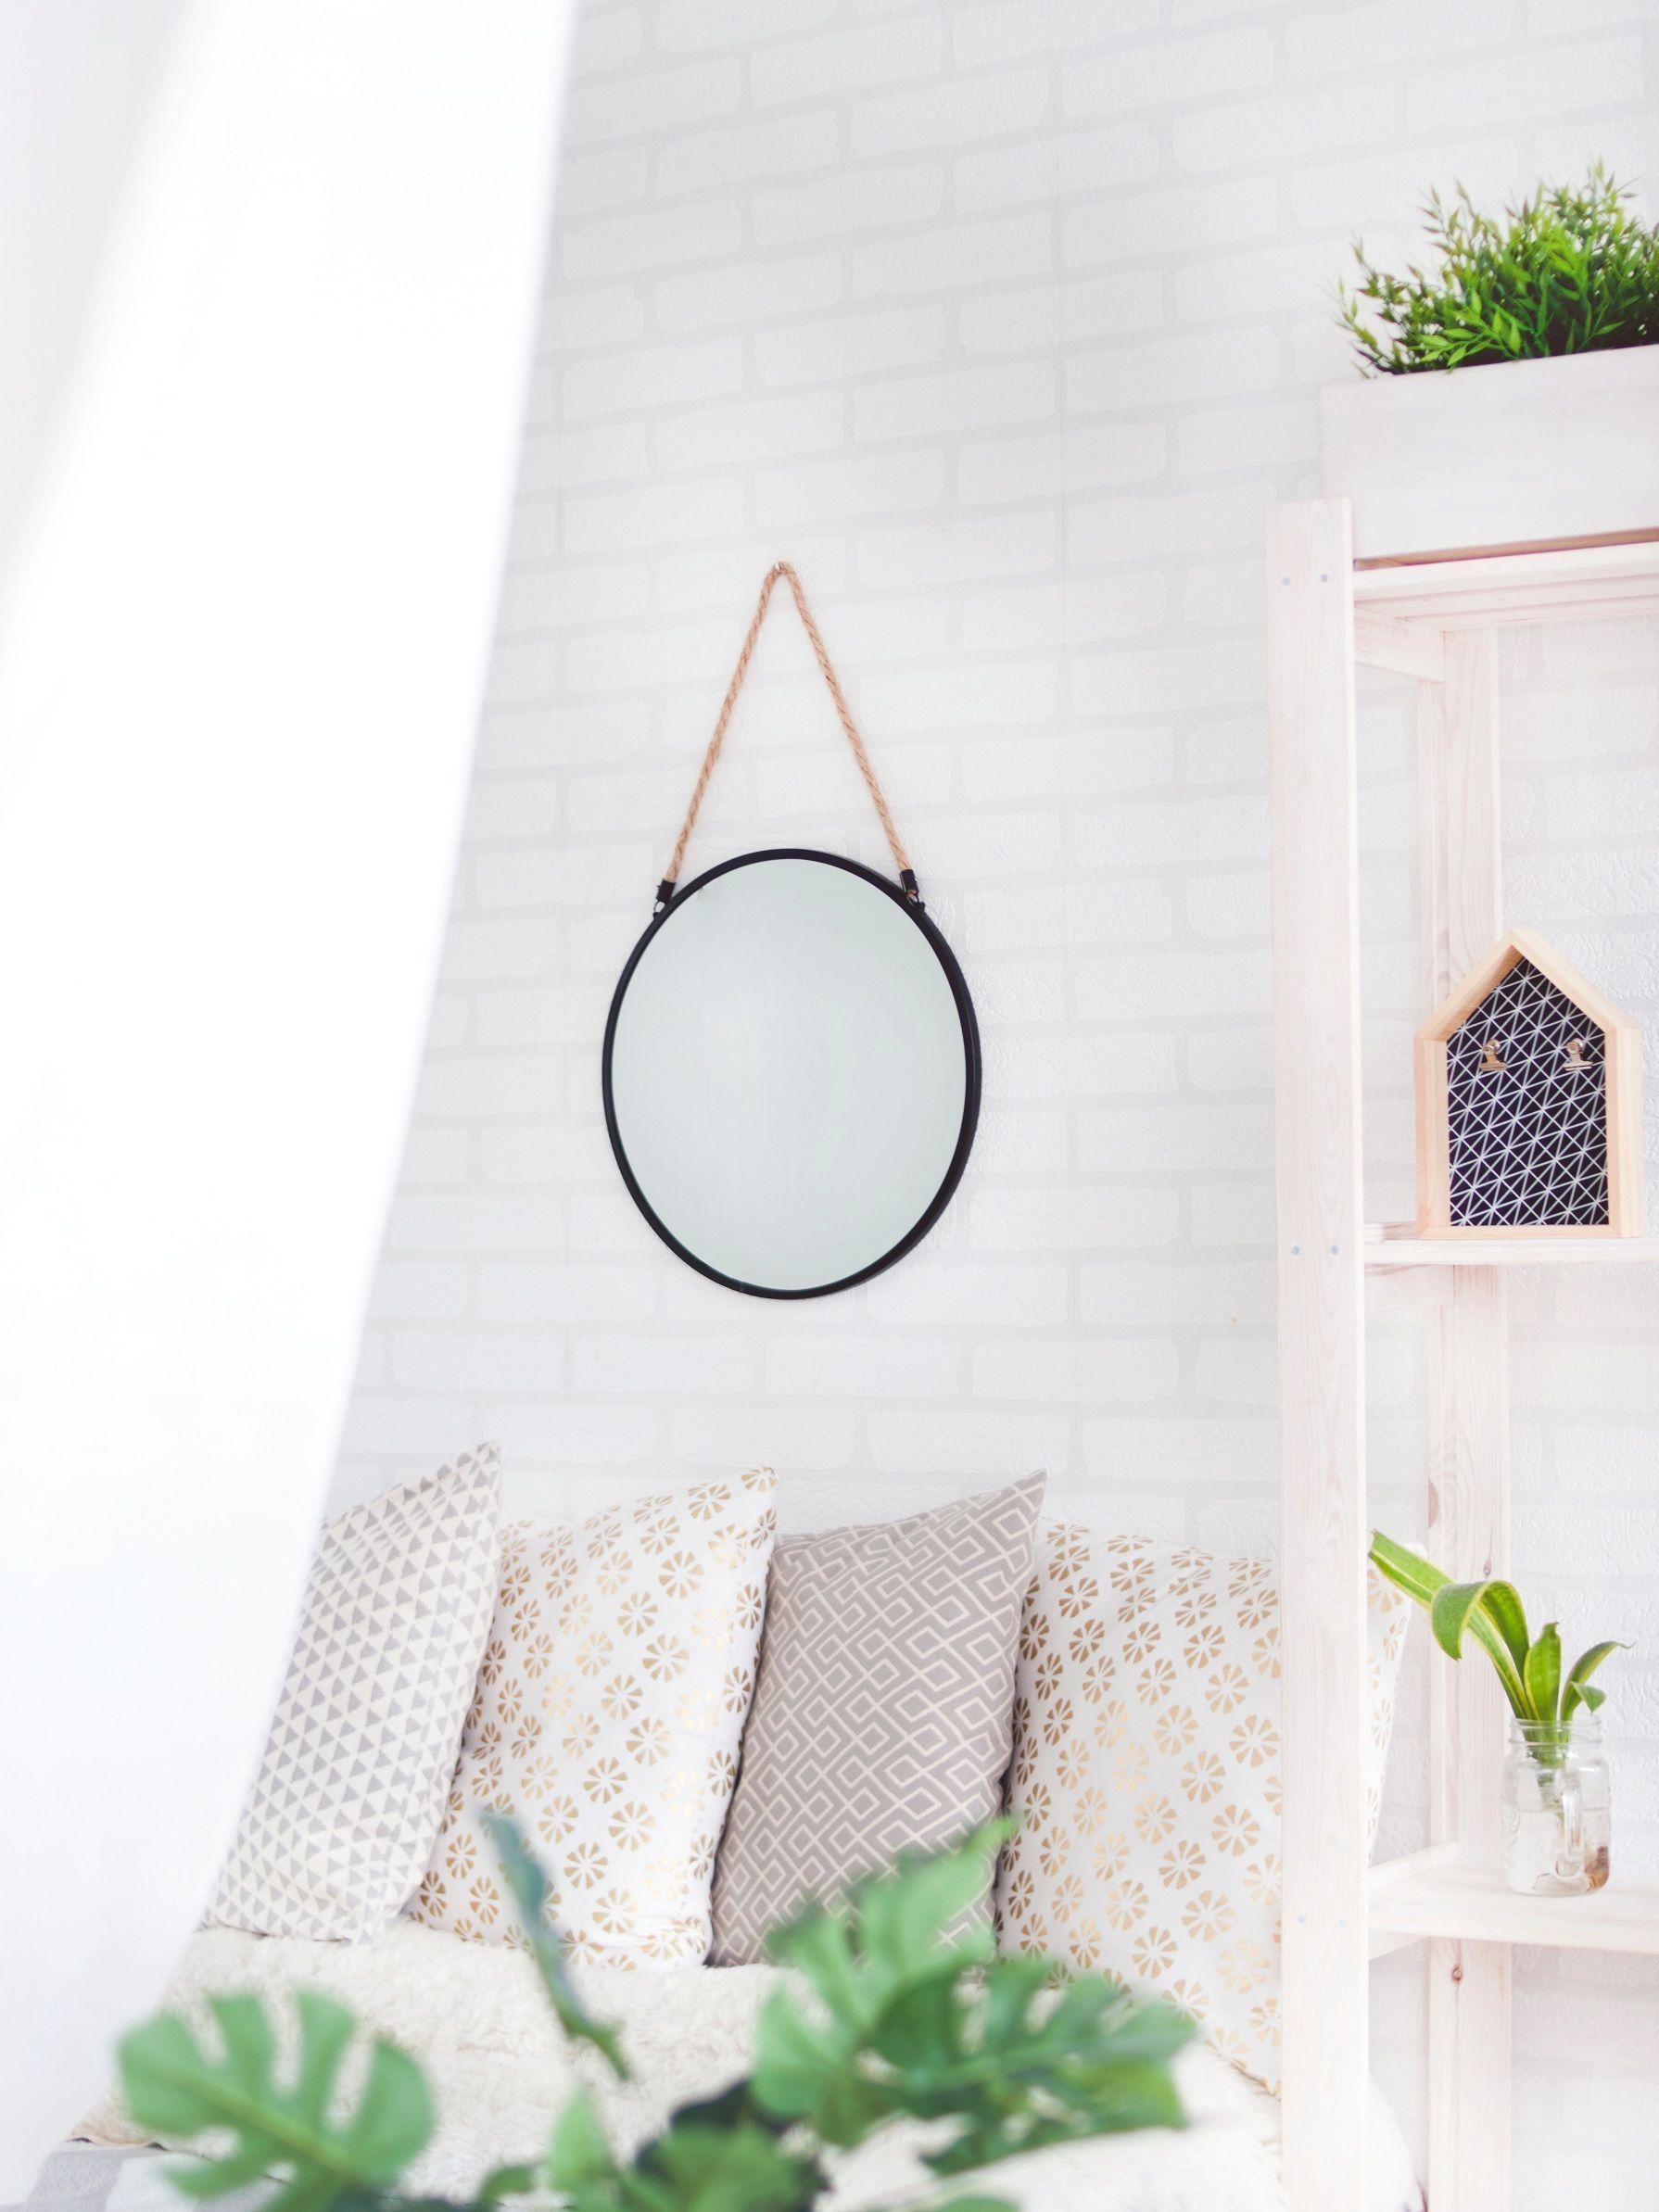 Master Scandinavian Interior Design In Easy Steps Home Decor Decor Scandinavian Interior